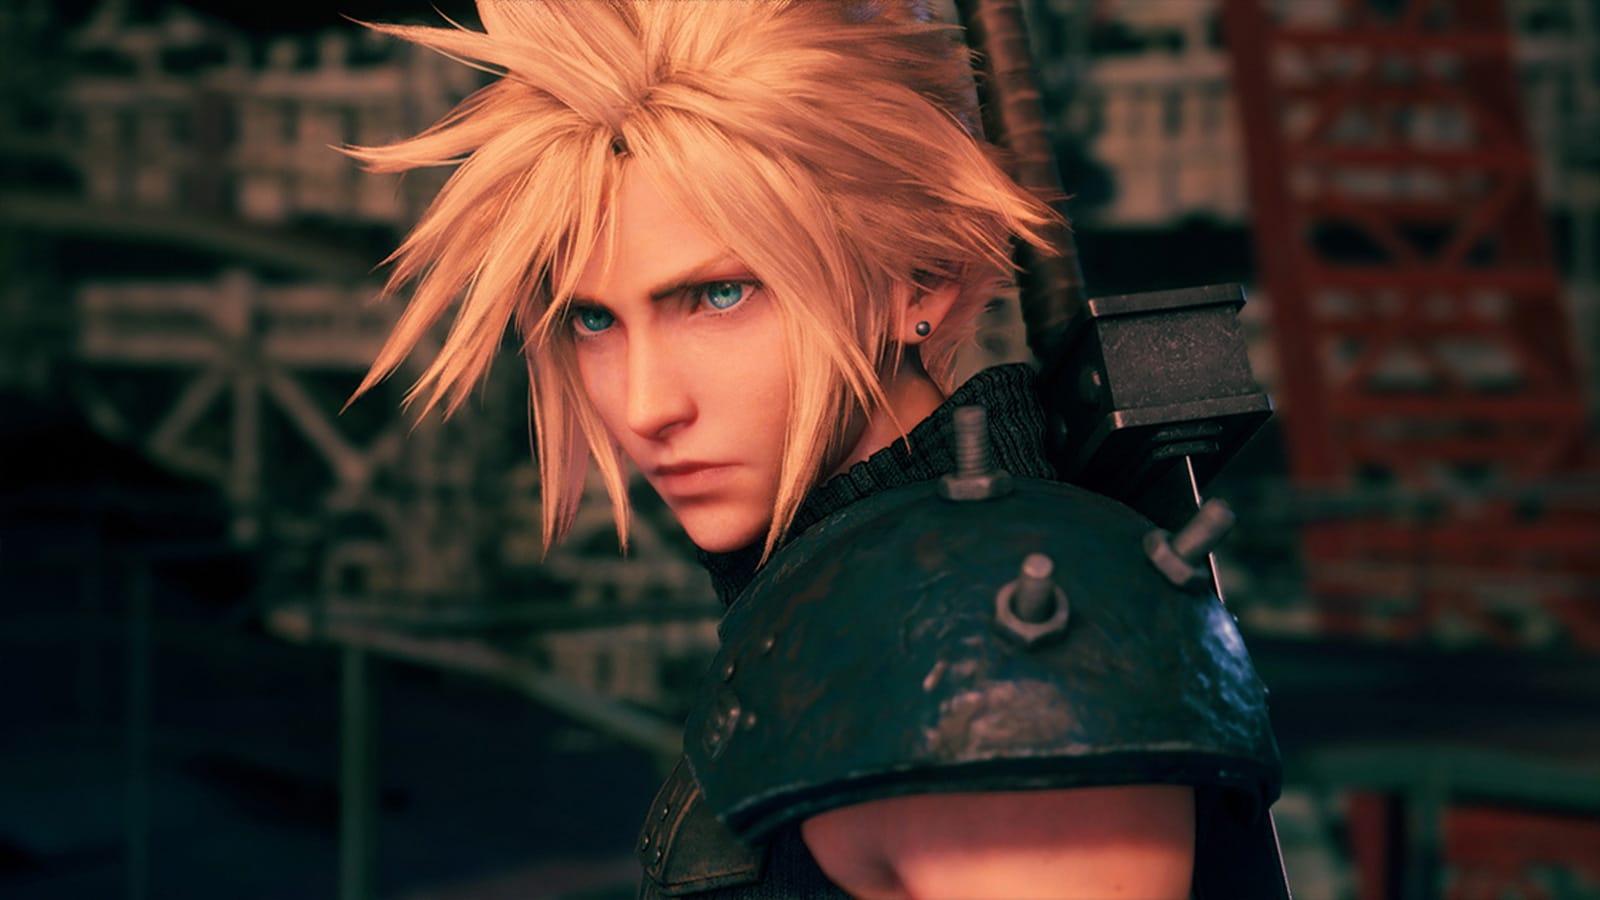 Cloud in 'Final Fantasy VII Remake'